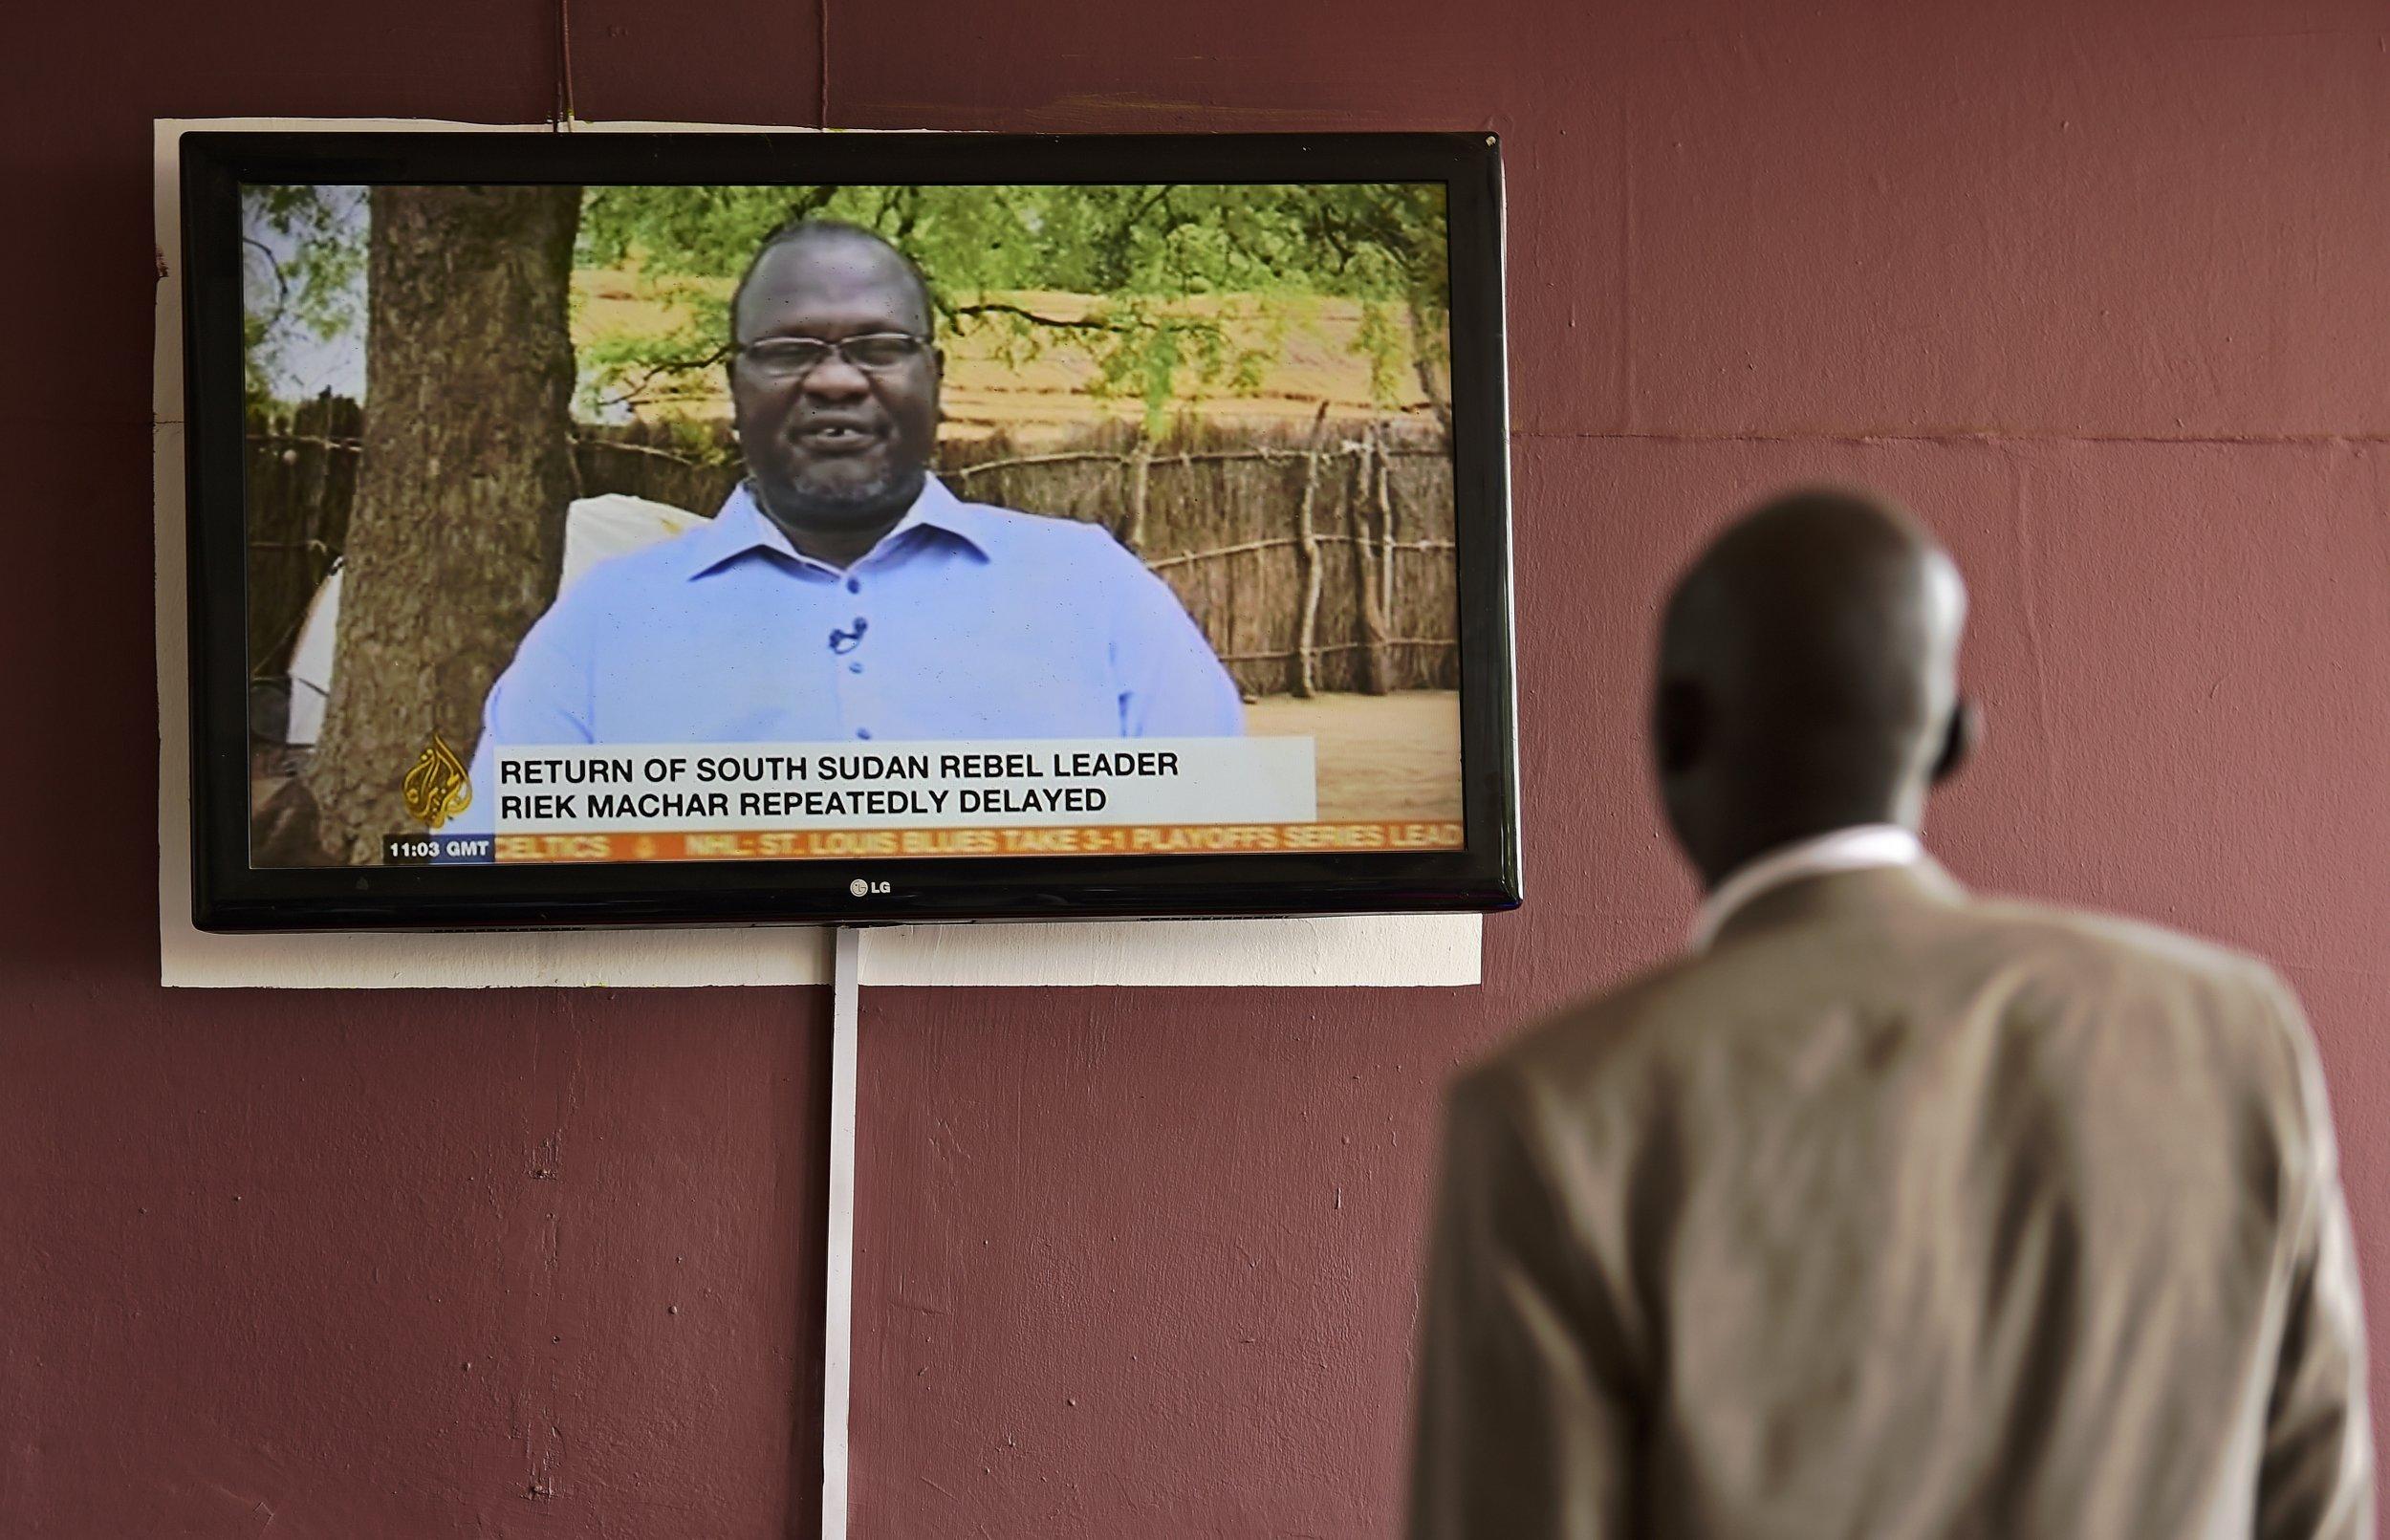 Riek Machar's delayed return to South Sudan on the news.